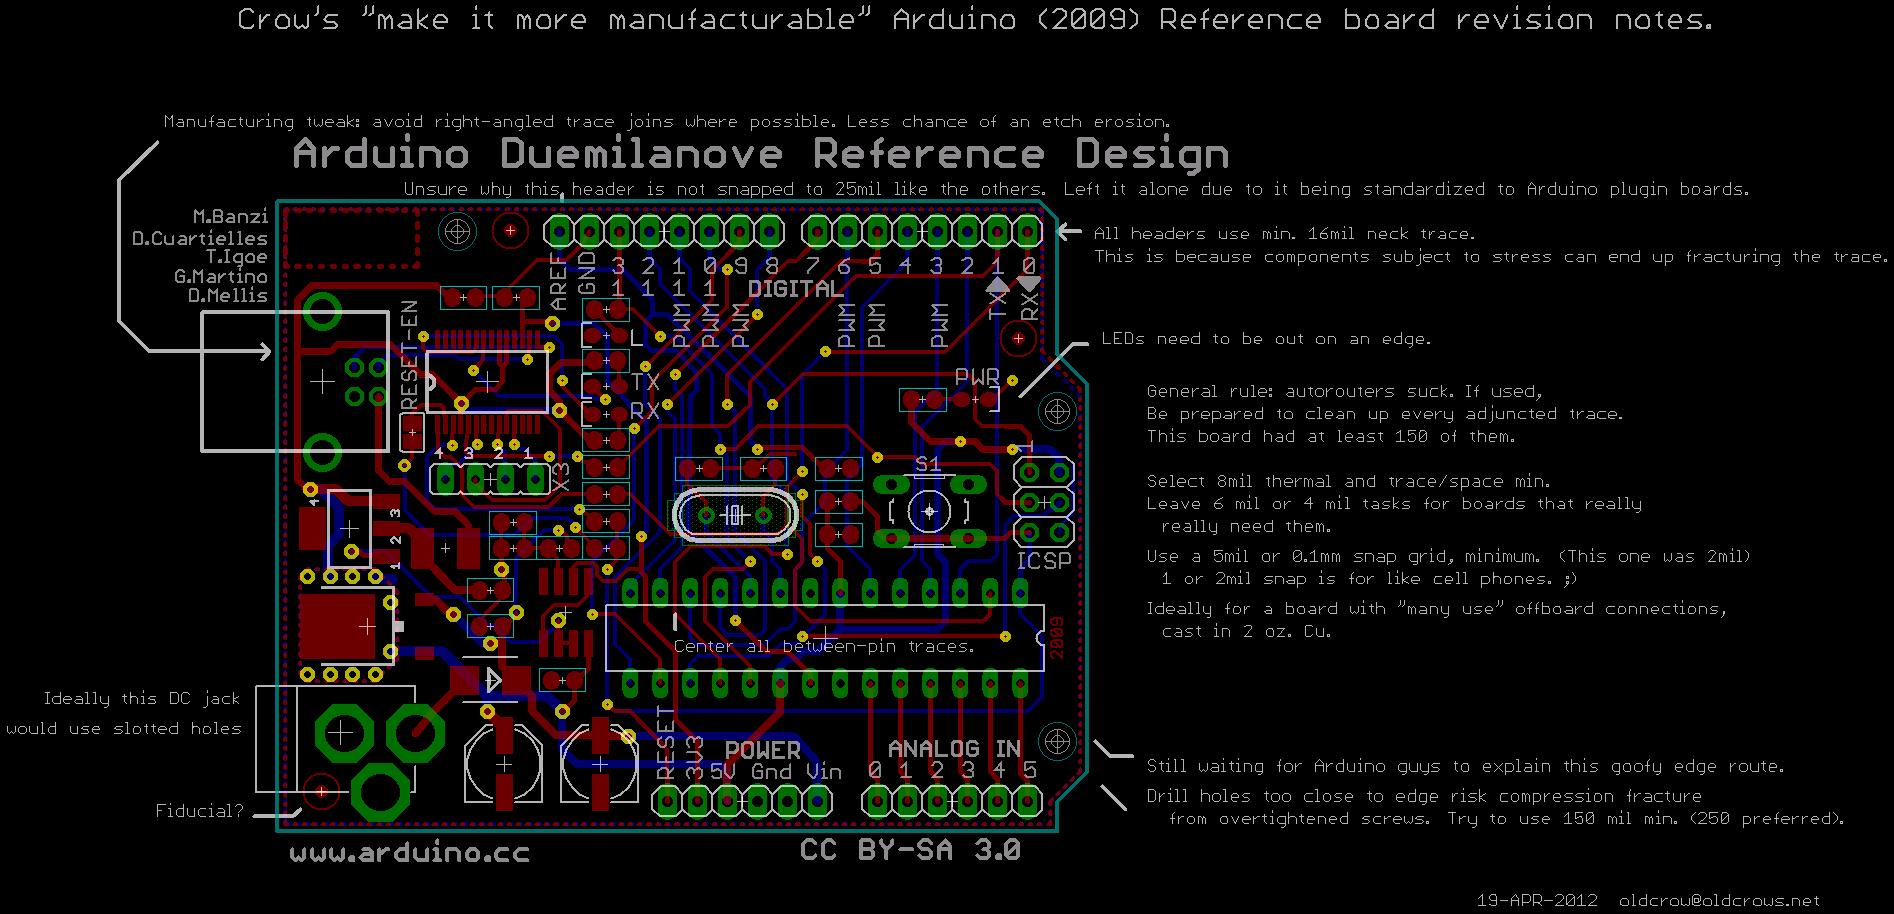 arduino_2009_crowstweaks_annotated_brd